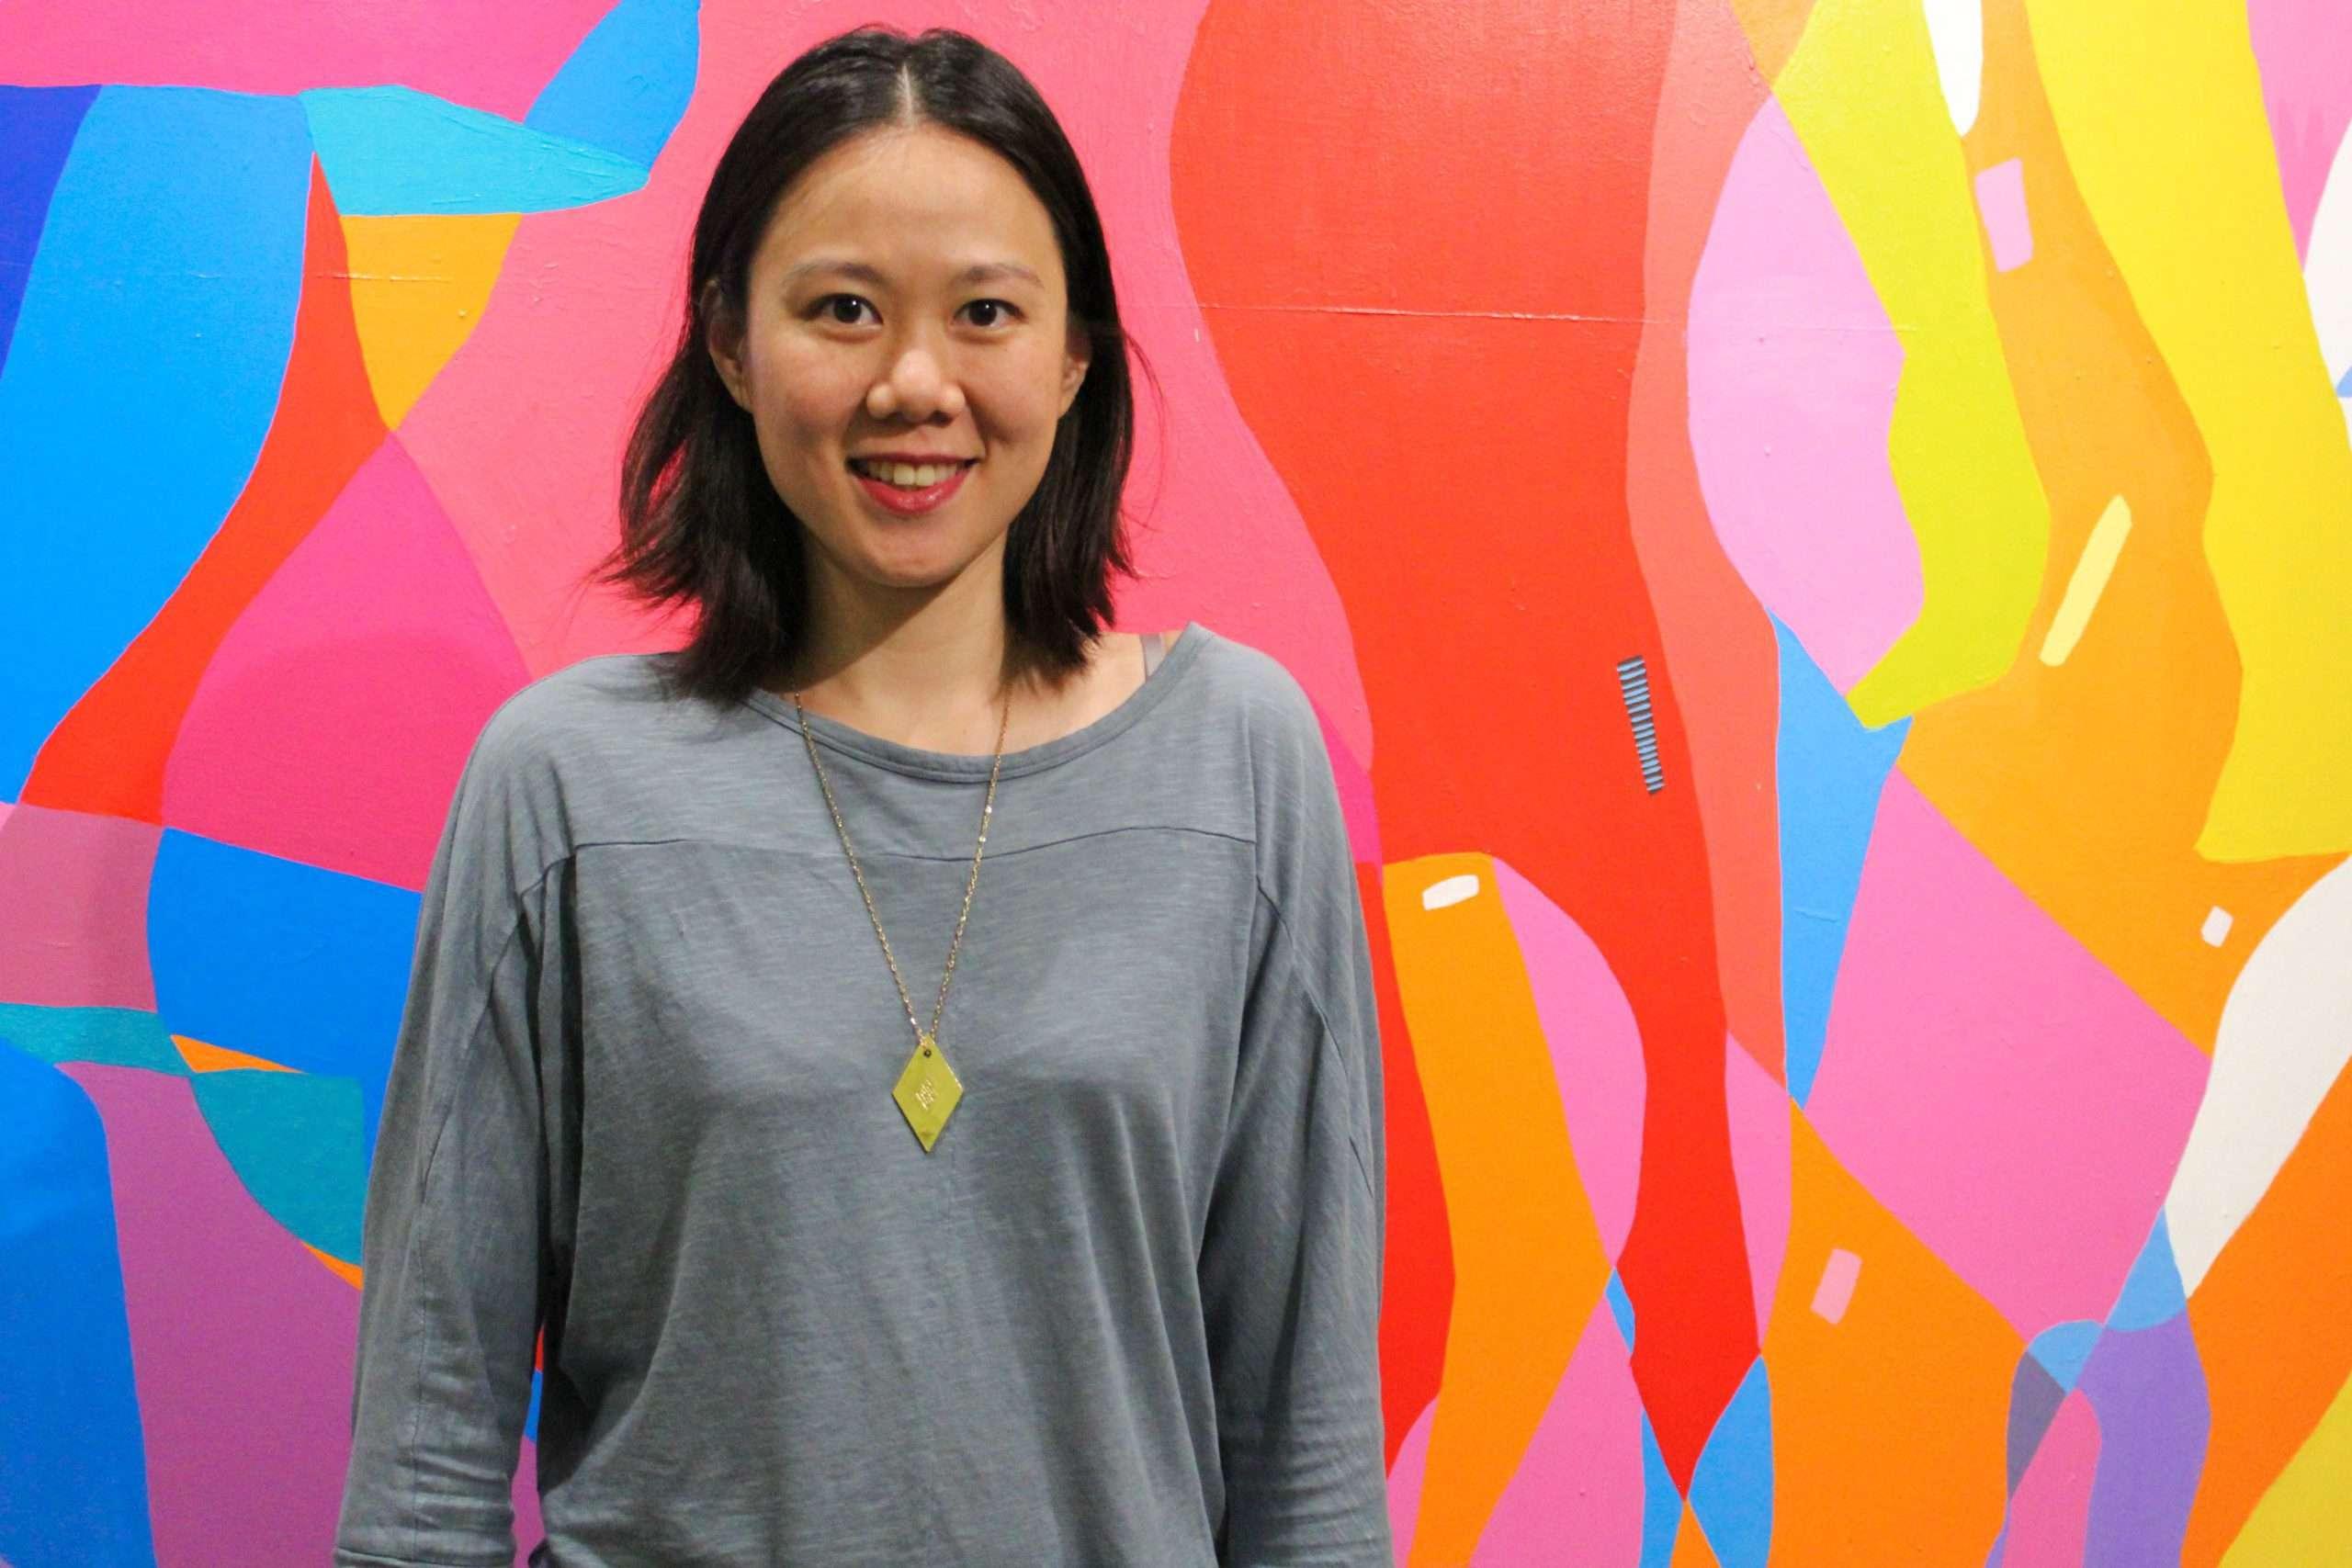 Sophie Pei-Yi Lau